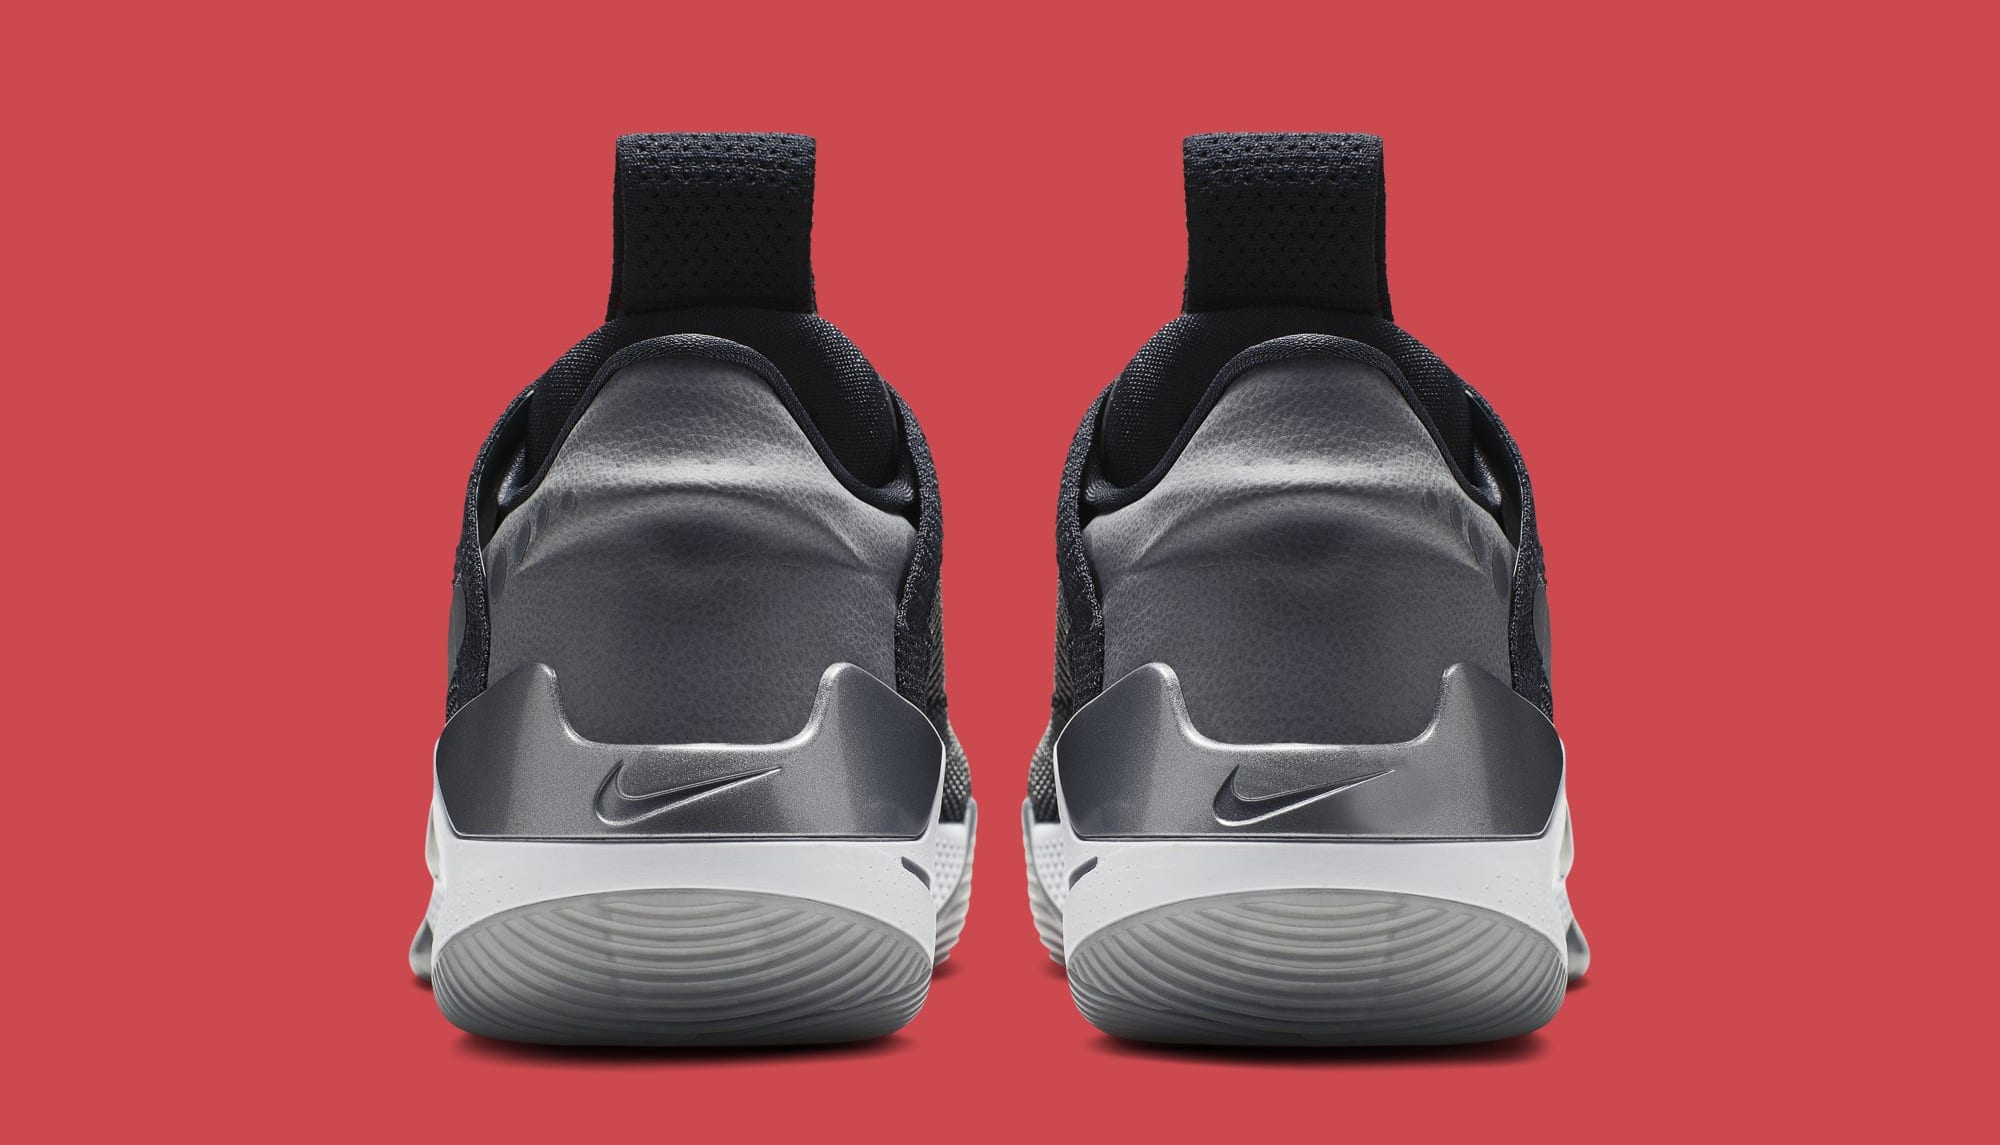 Nike Adapt BB 'Dark Grey' AO2582-004 (Heel)